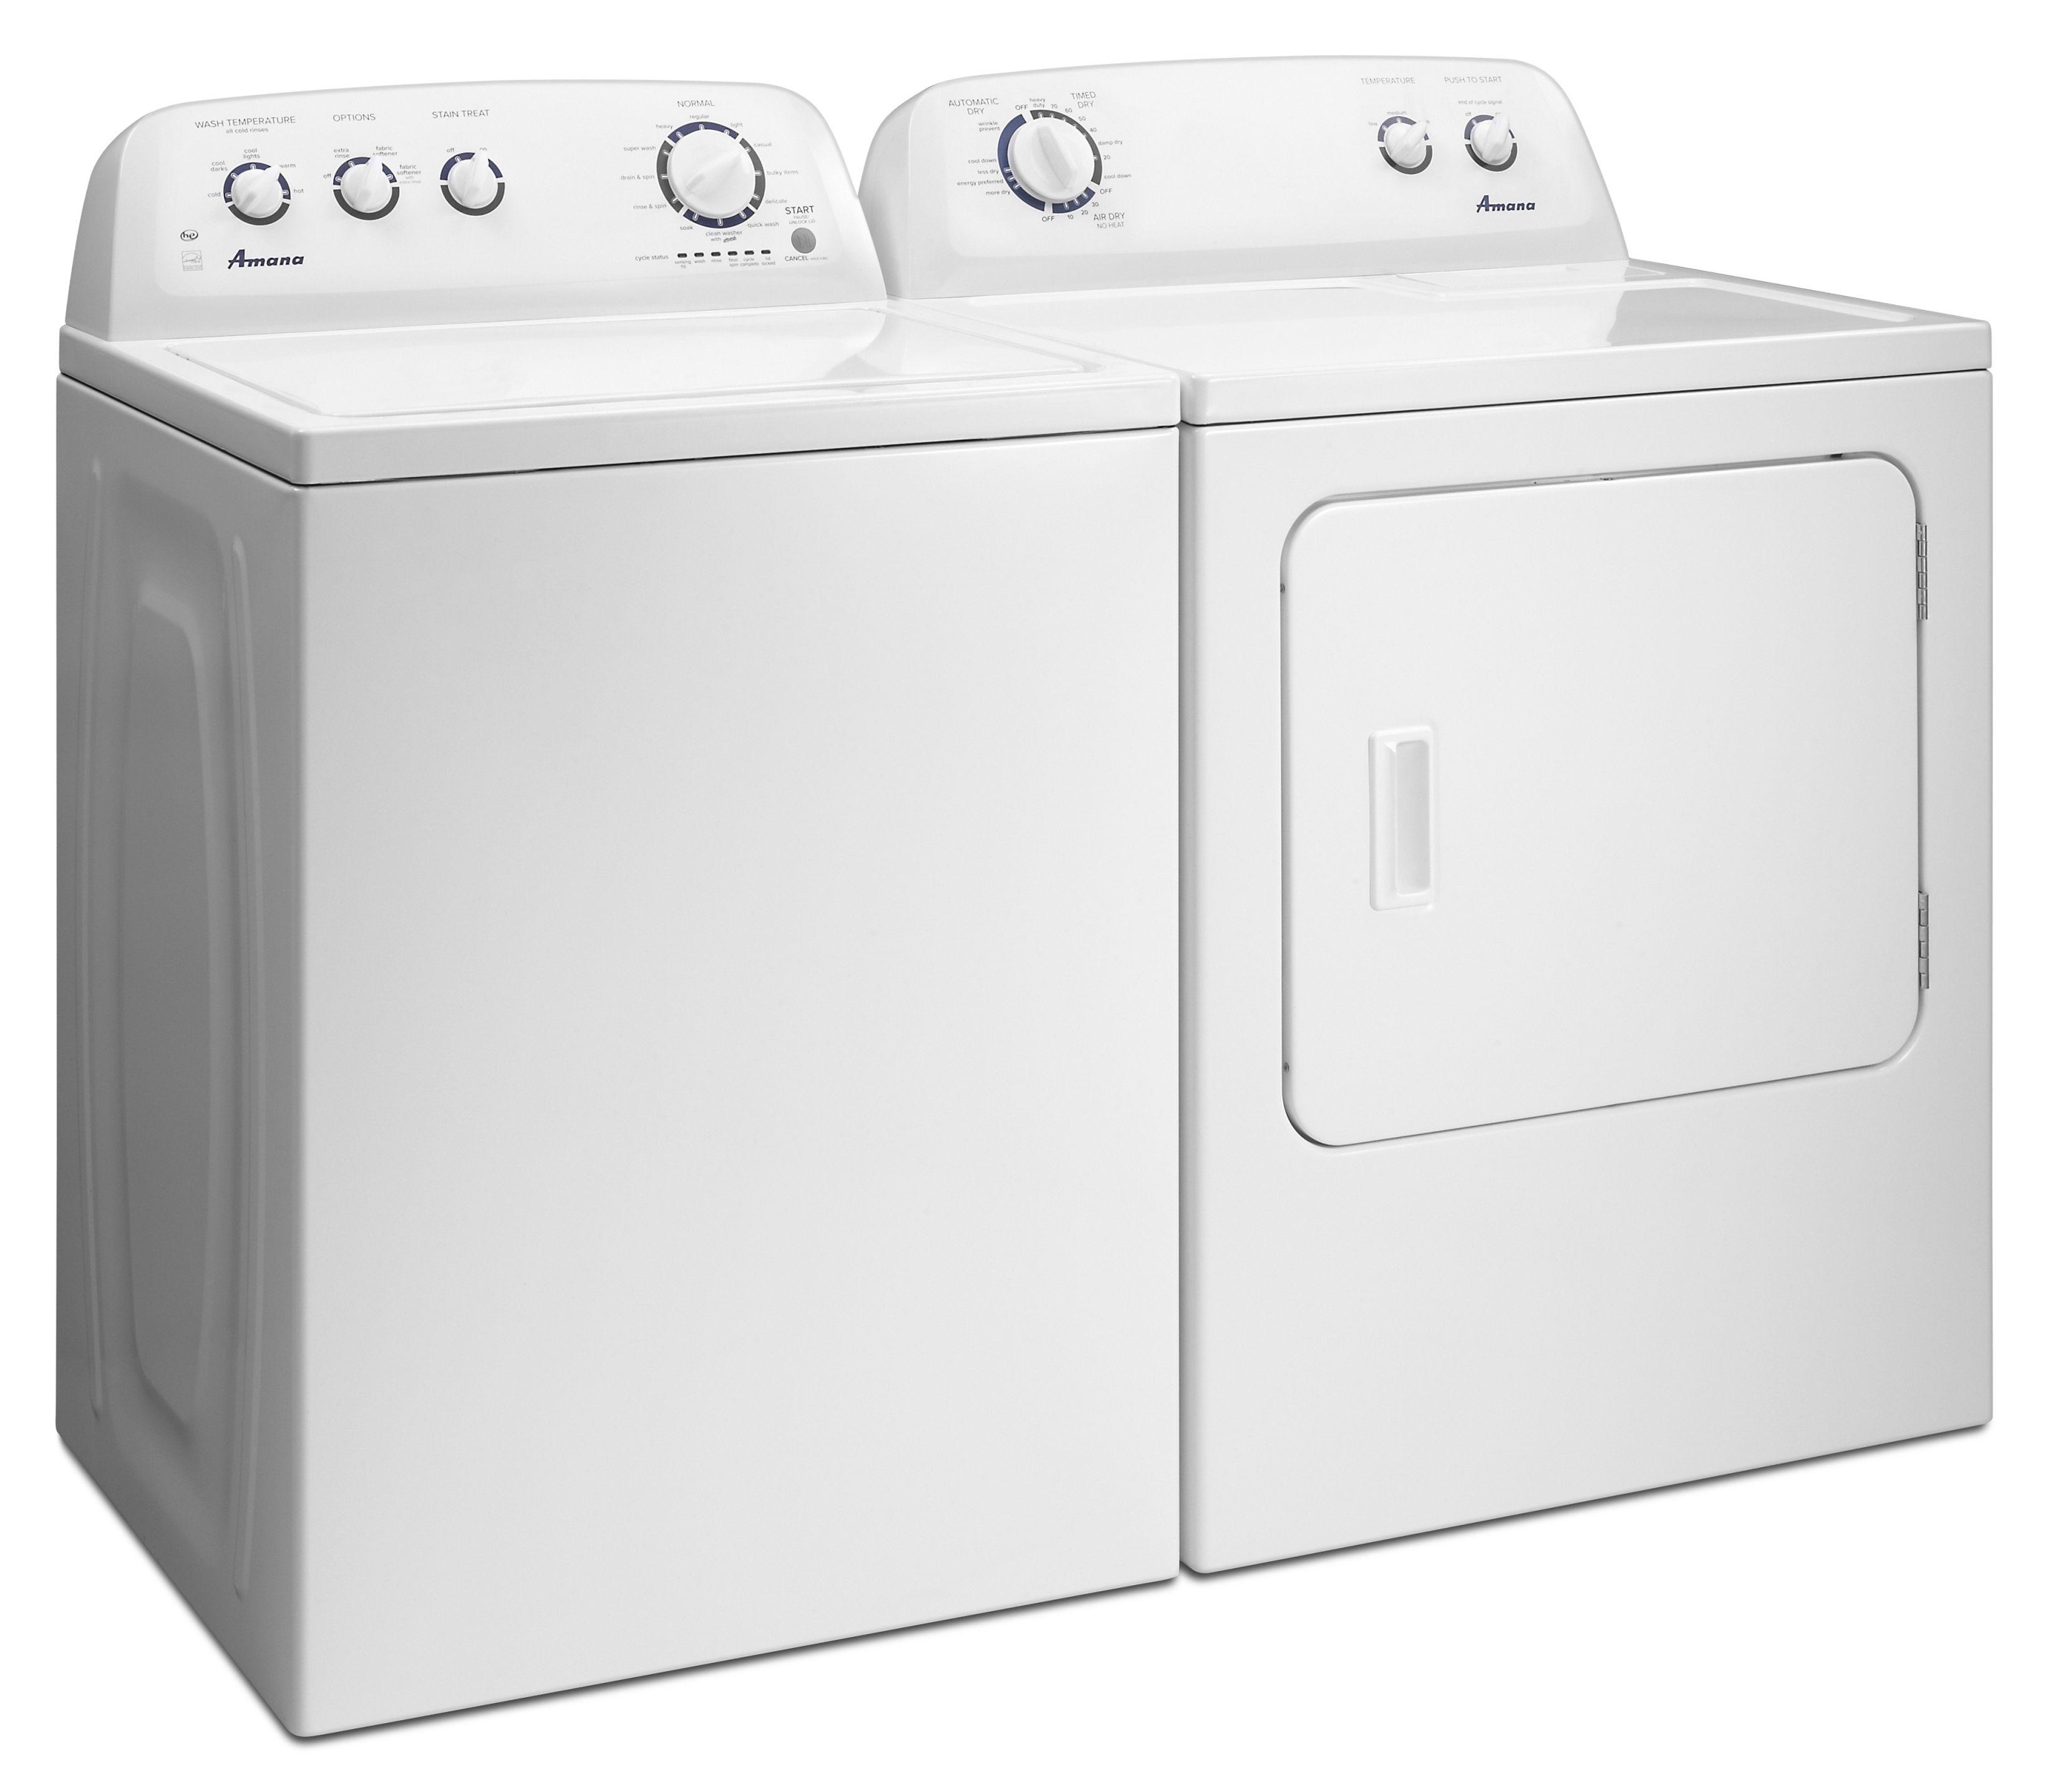 Win: Washer & Dryer from Amana | Amana washer, Amana ...